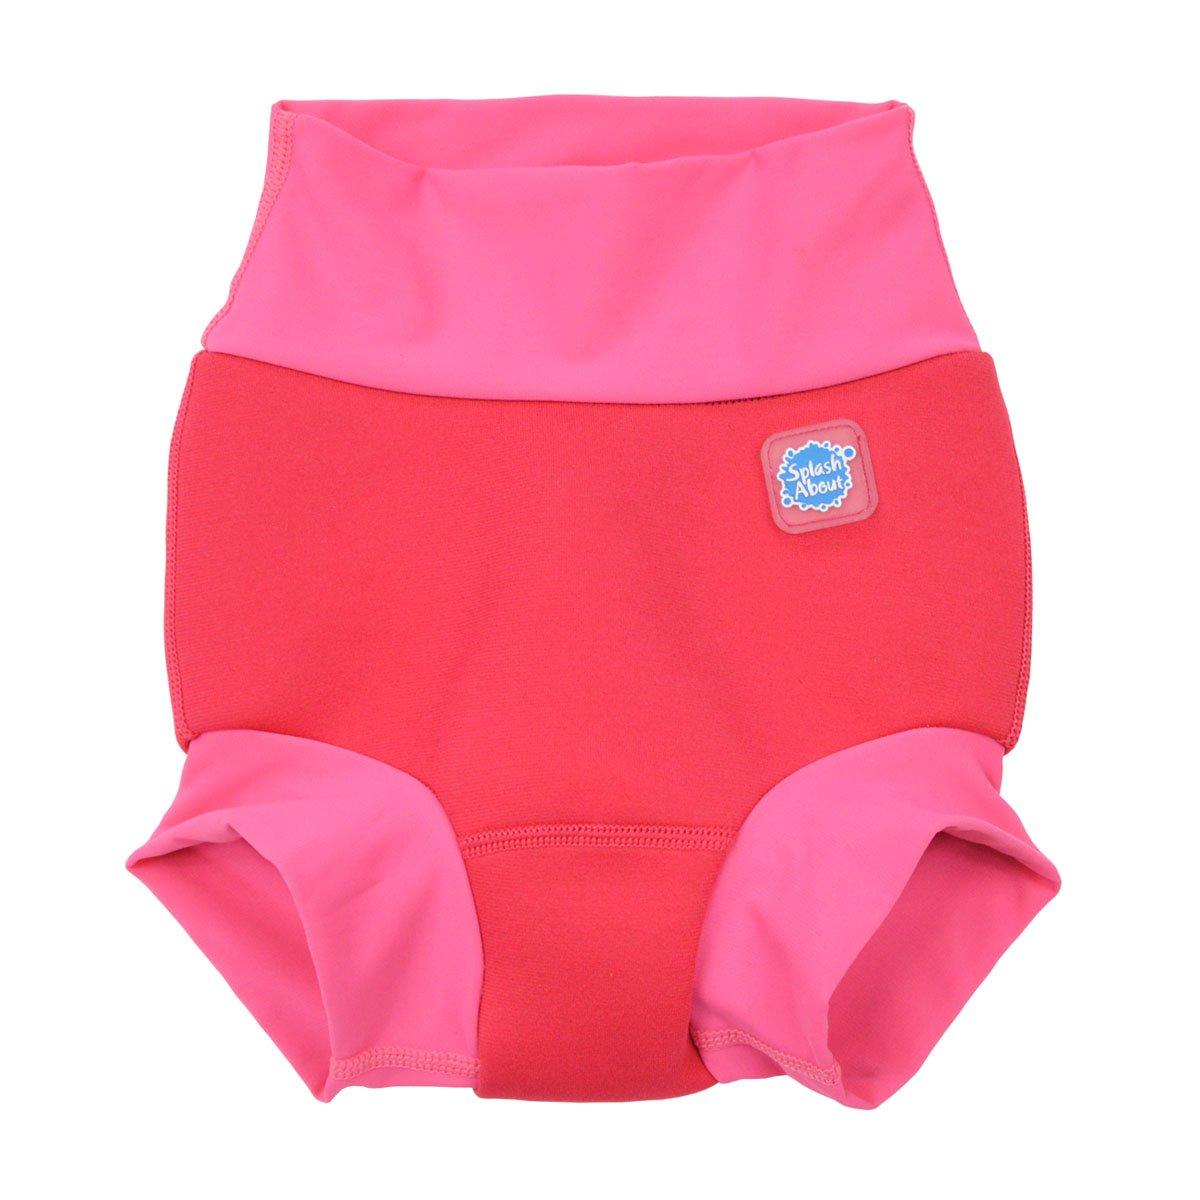 Geranium Splash About Baby Kids New Improved Happy Nappy,Pink ,6-12 Months